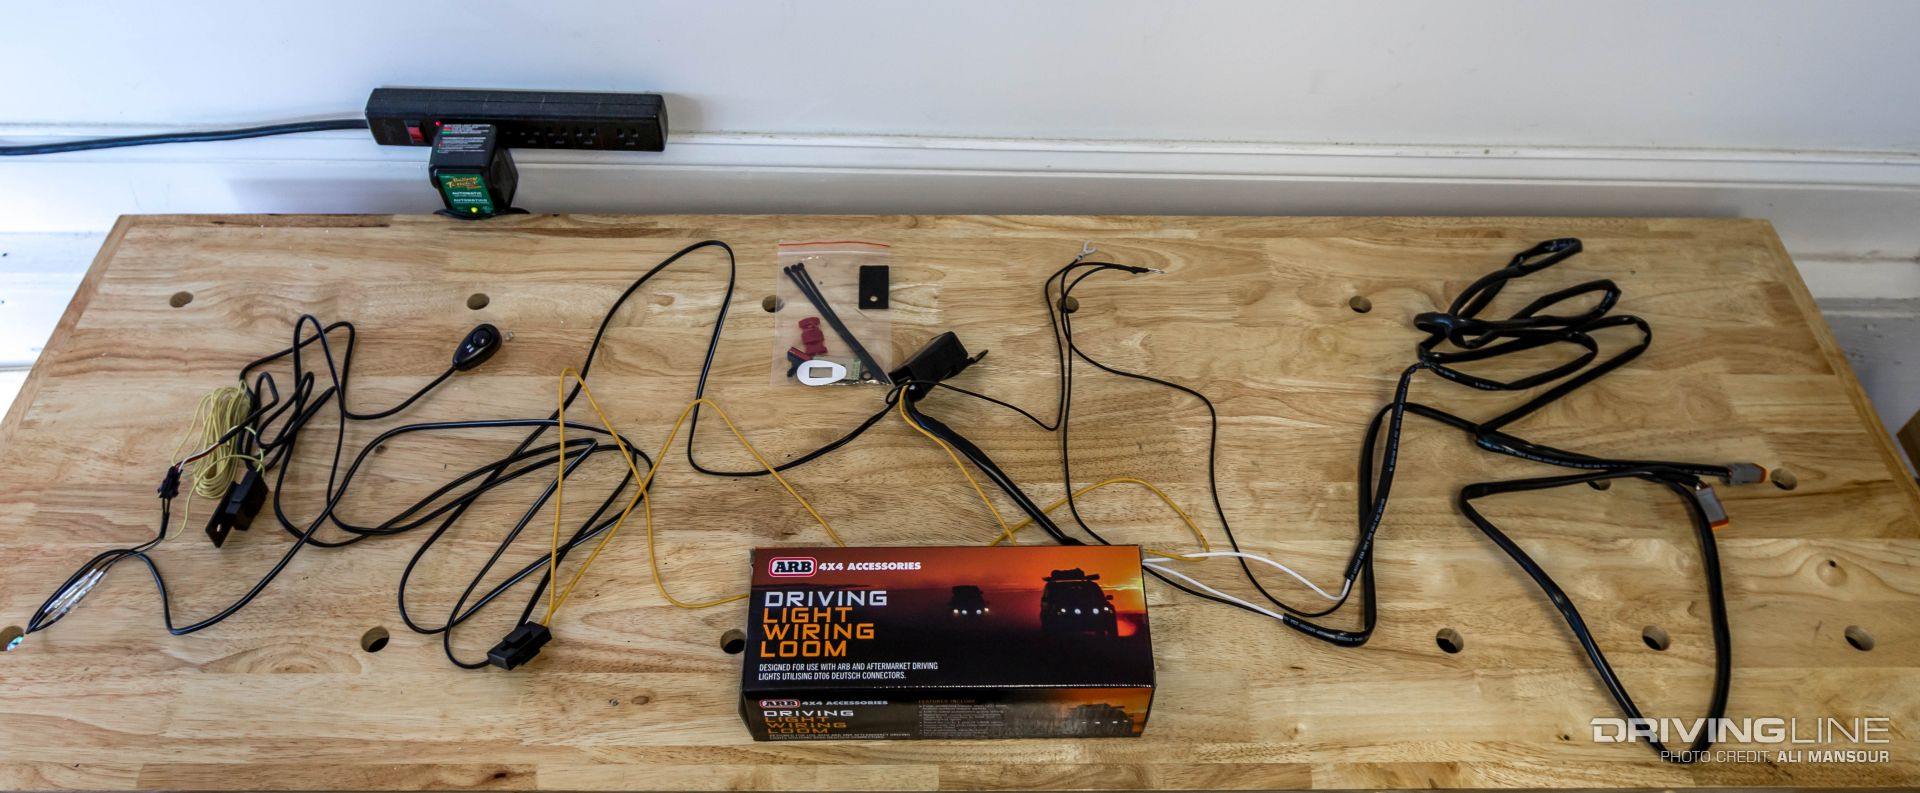 [DIAGRAM_4PO]  ARB AR21 Intensity Light Review   DrivingLine   Arb Wiring Harness Lighting      DrivingLine